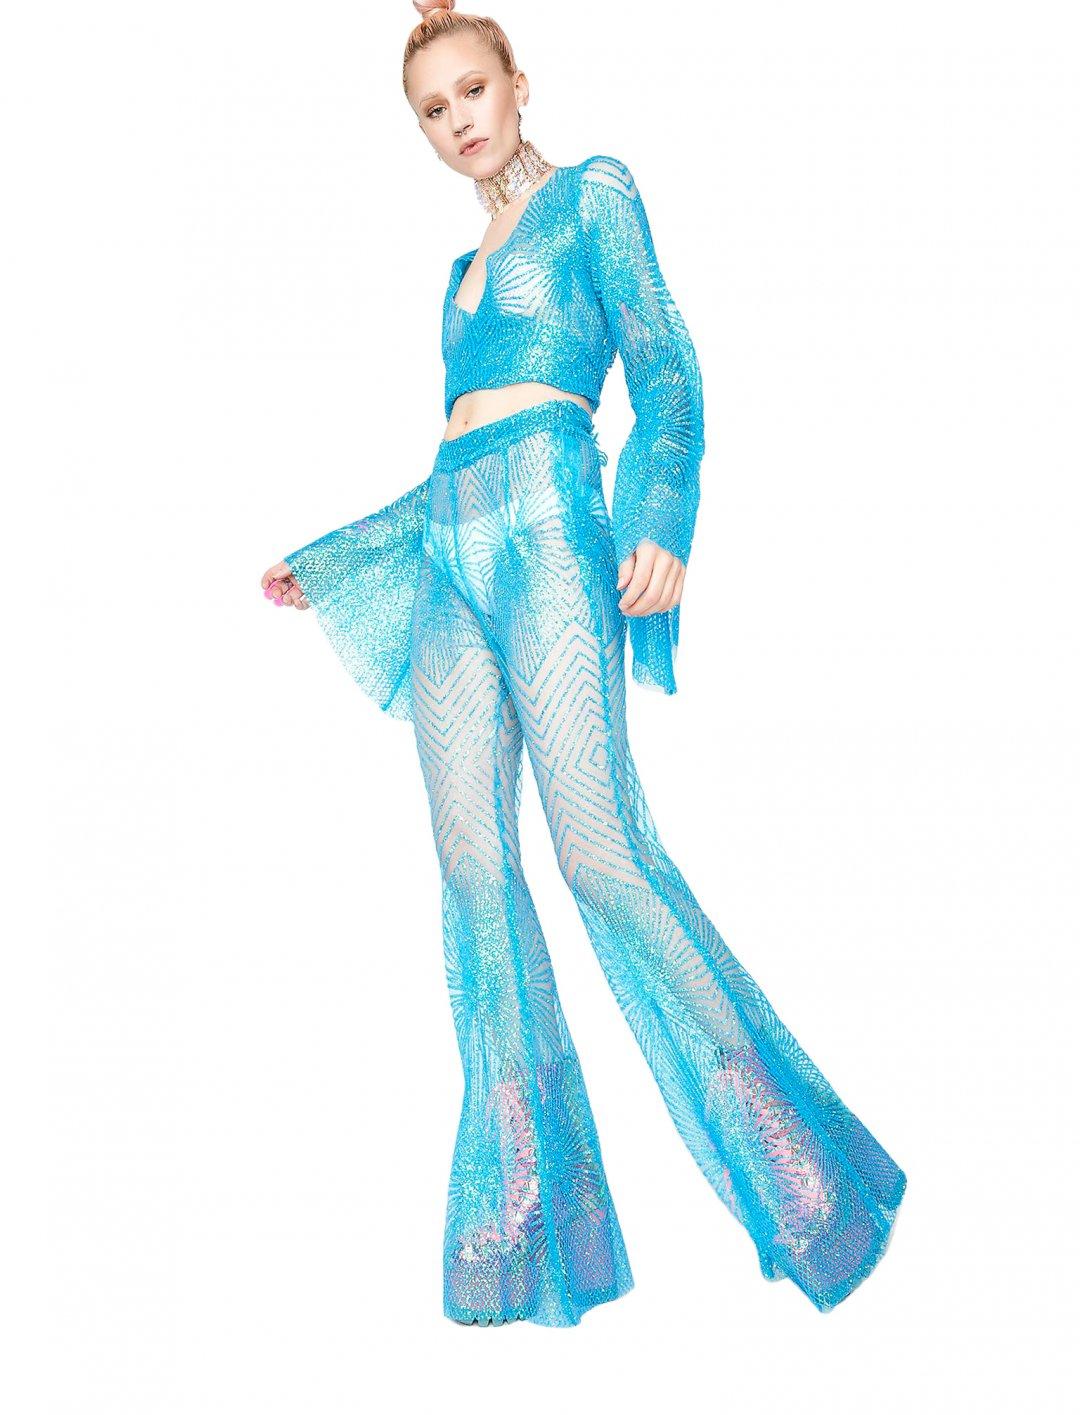 Zara Larsson's Trousers Clothing Elsie & Fred